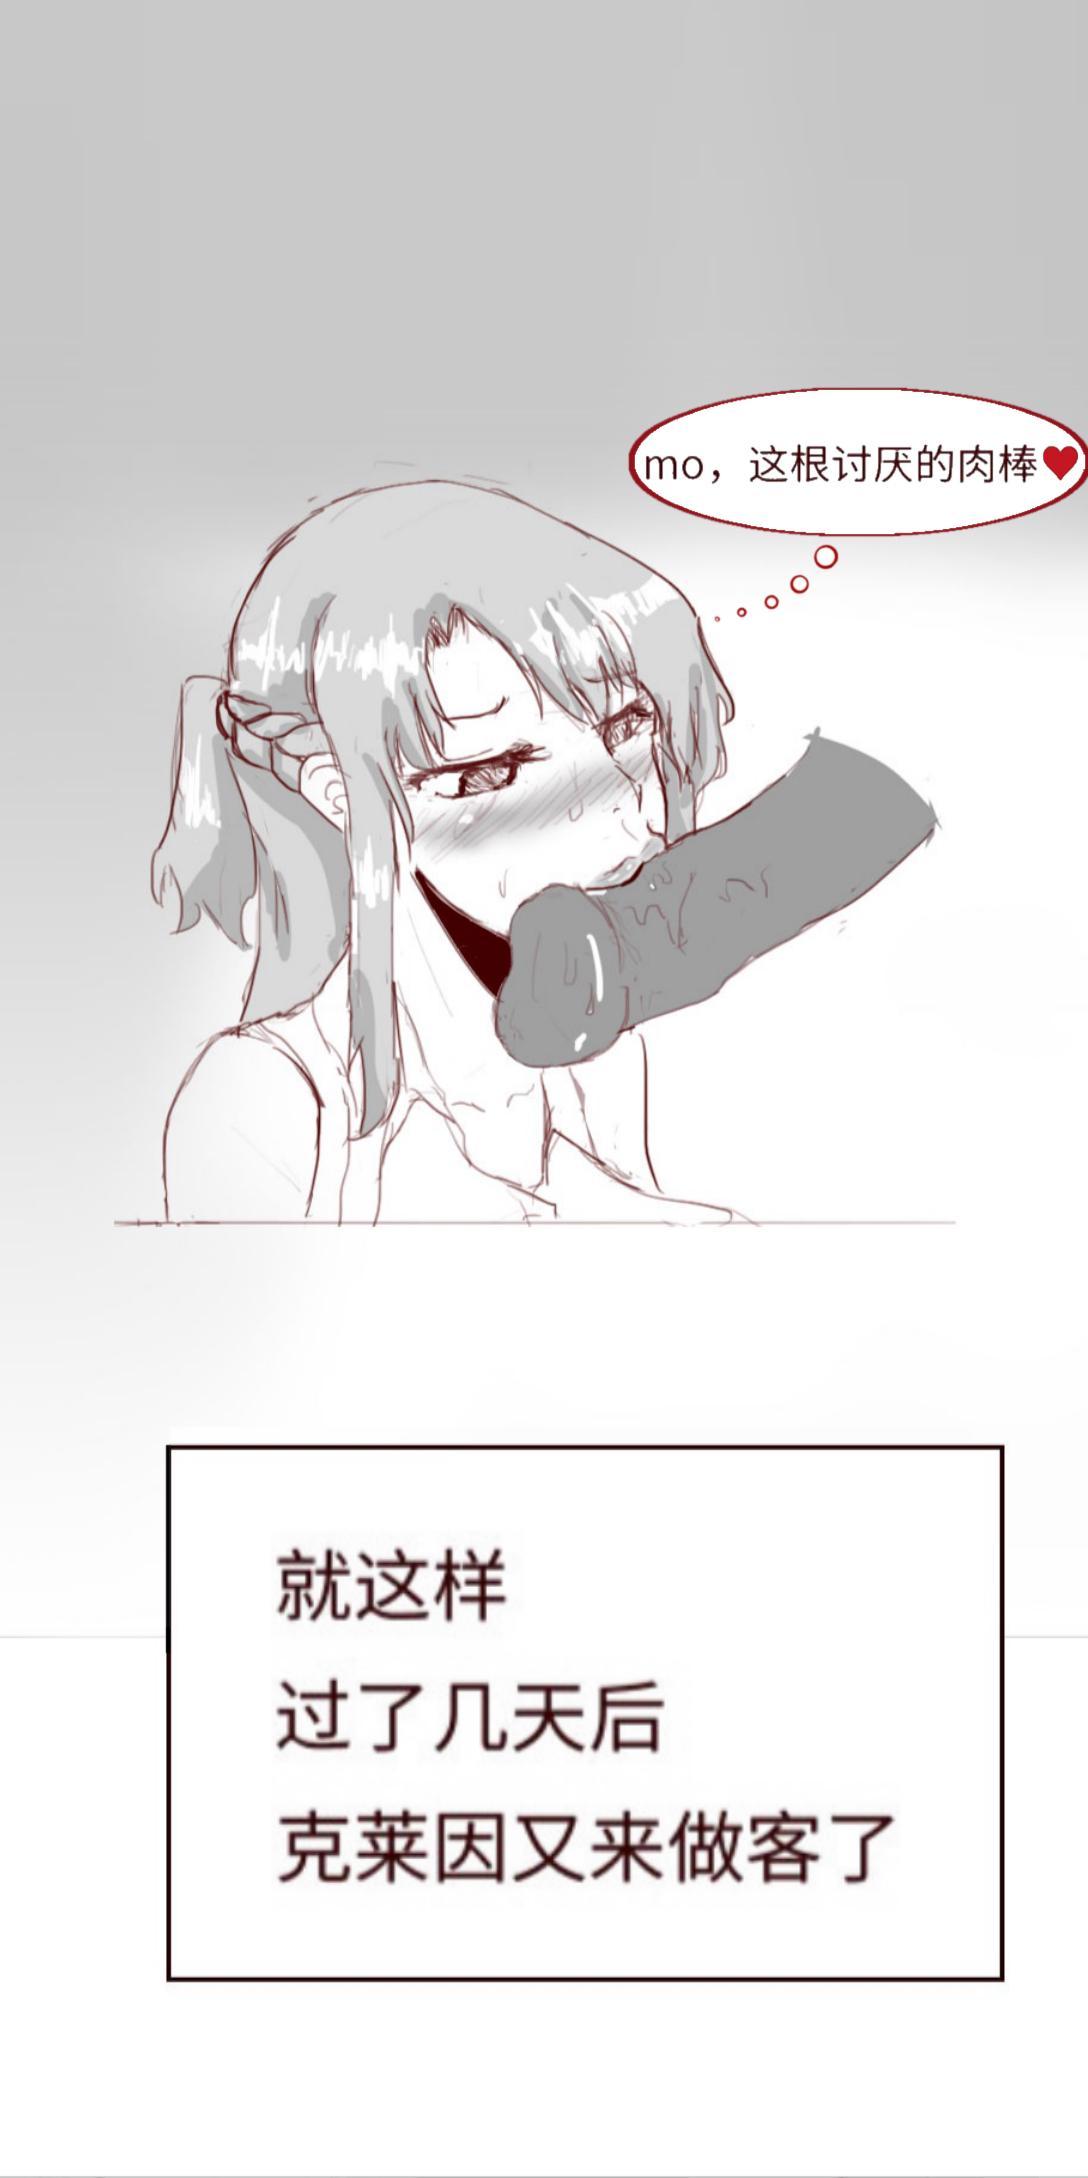 SAO里发生的一个sex bug 12